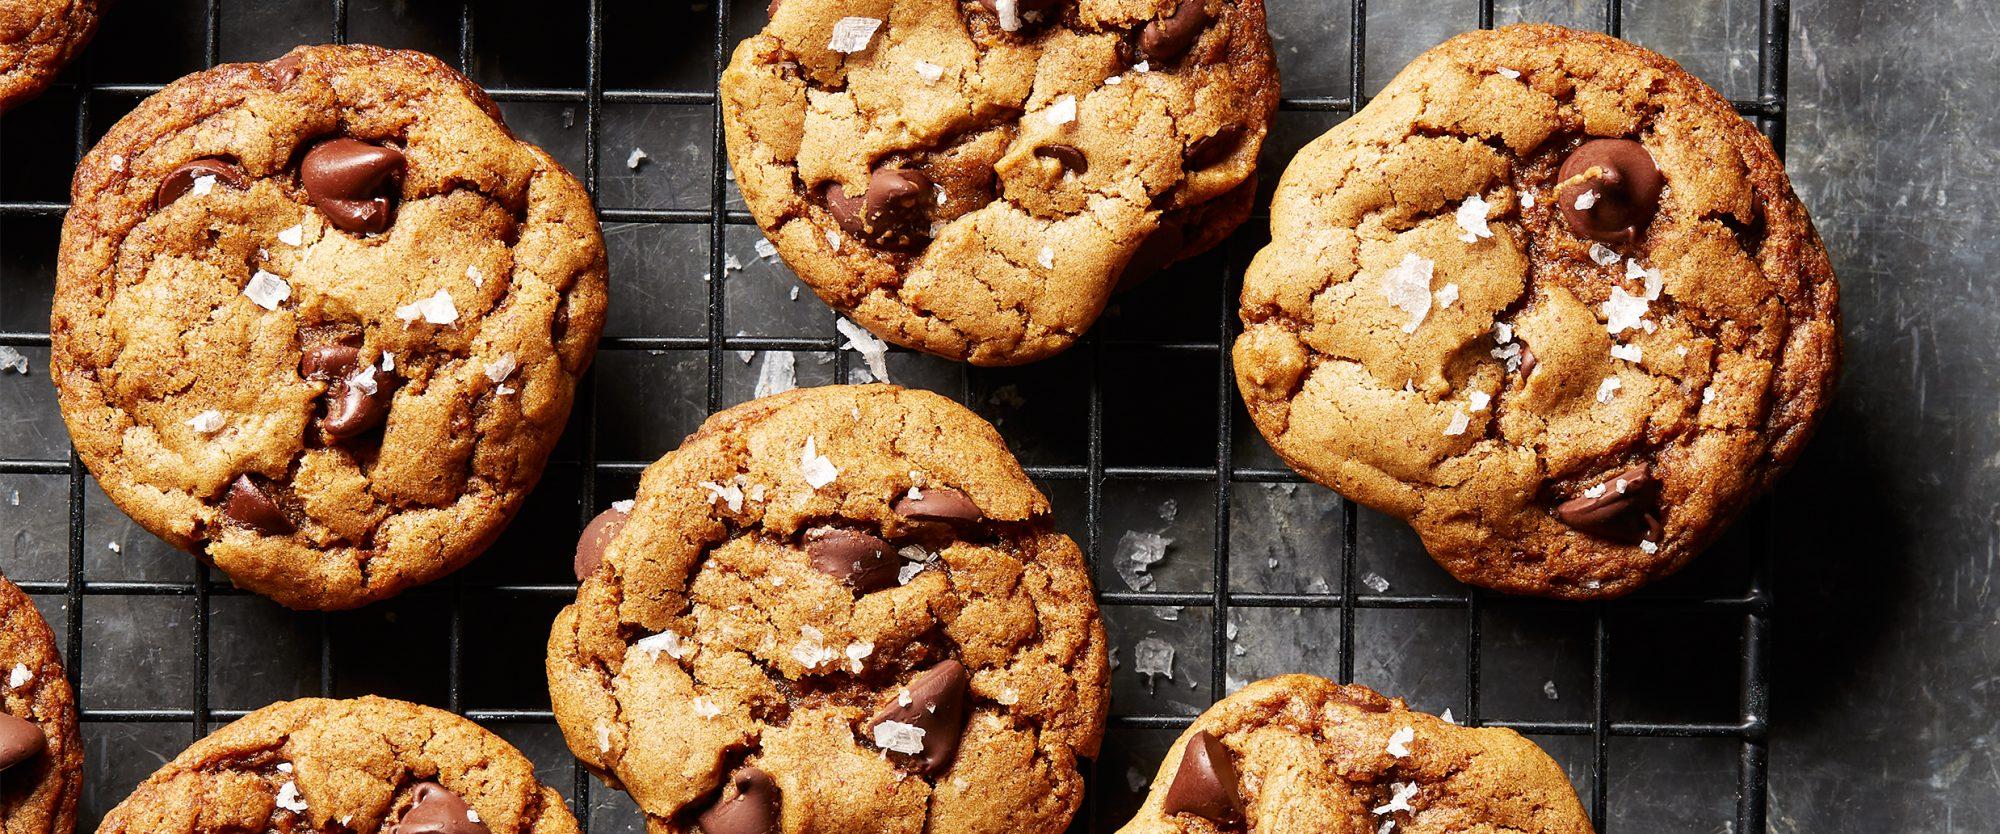 vegan chocolate chip ancho chile cookies hero